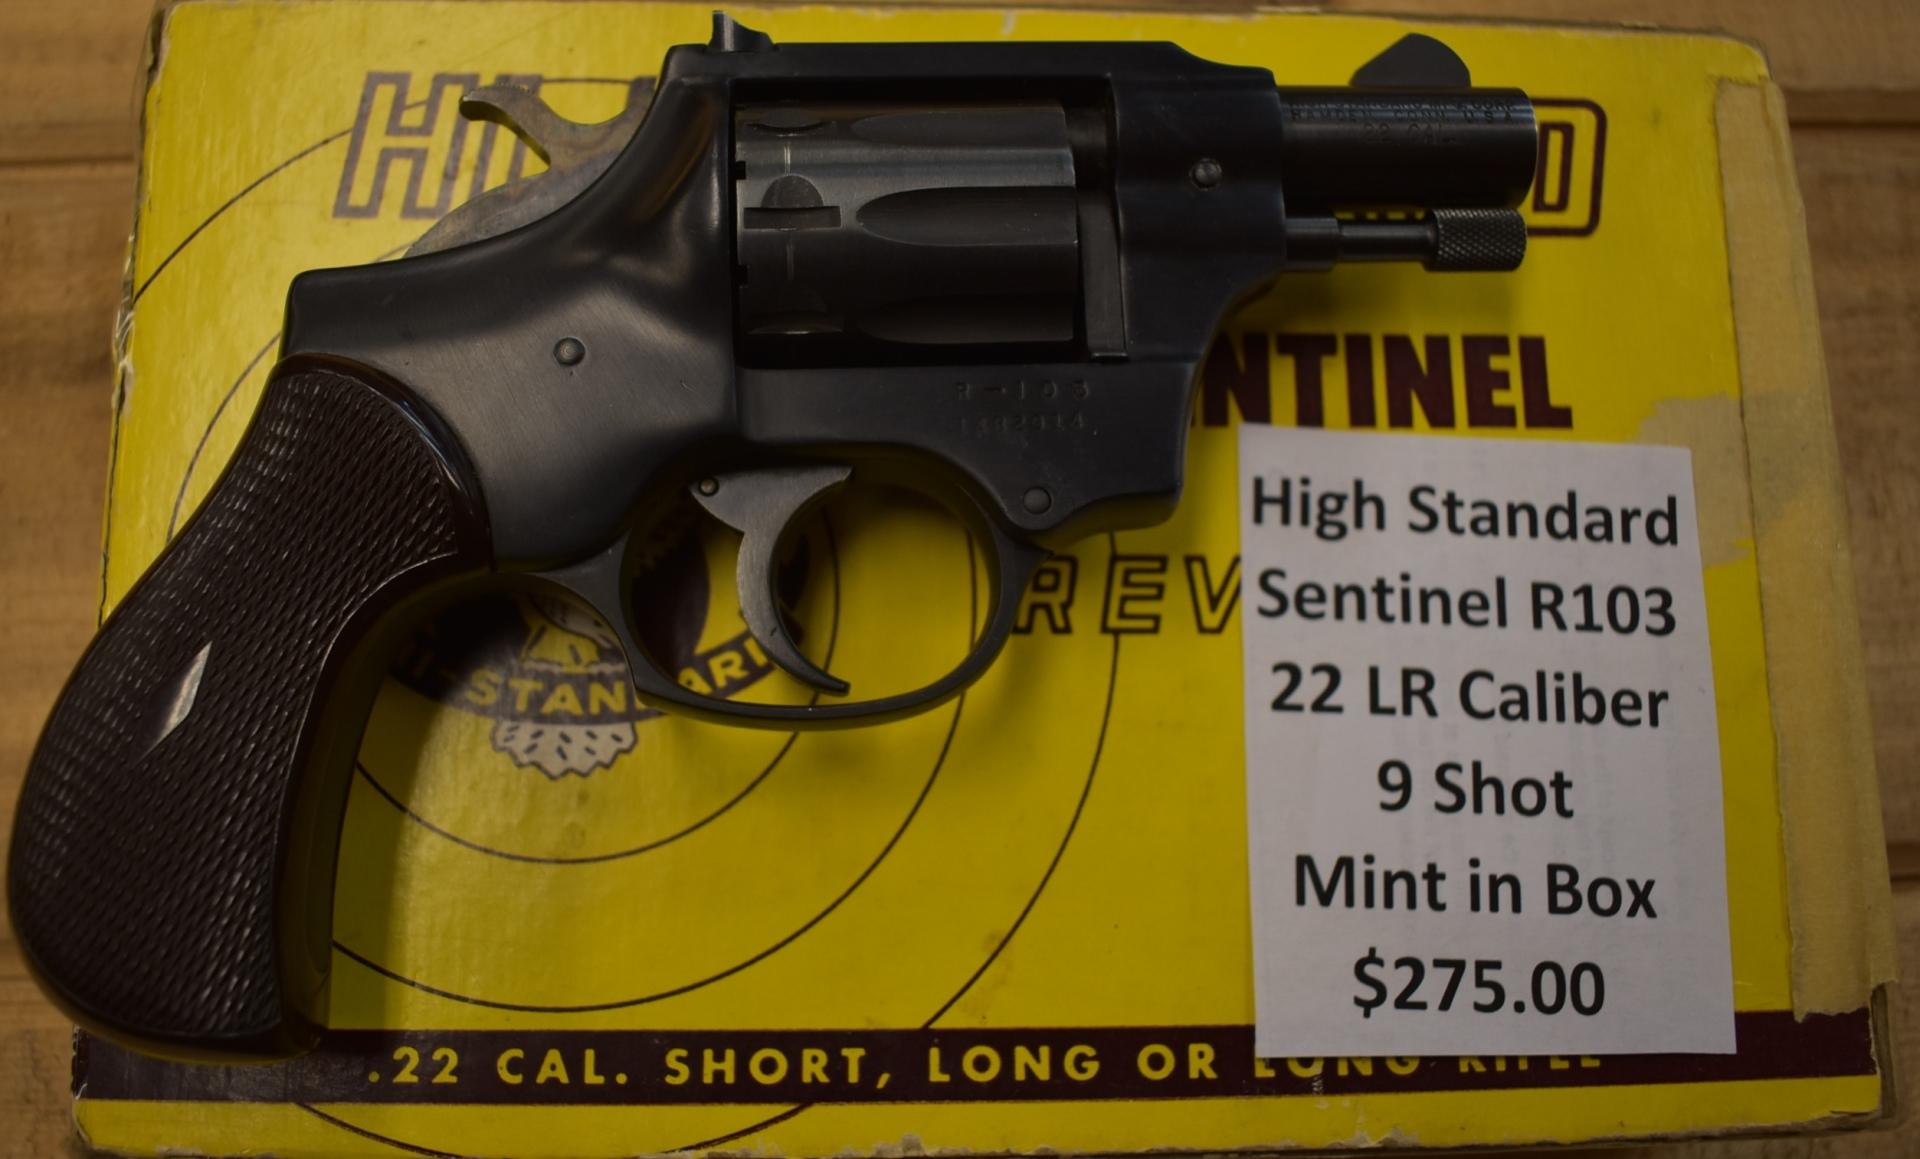 High Standard Sentinel R103